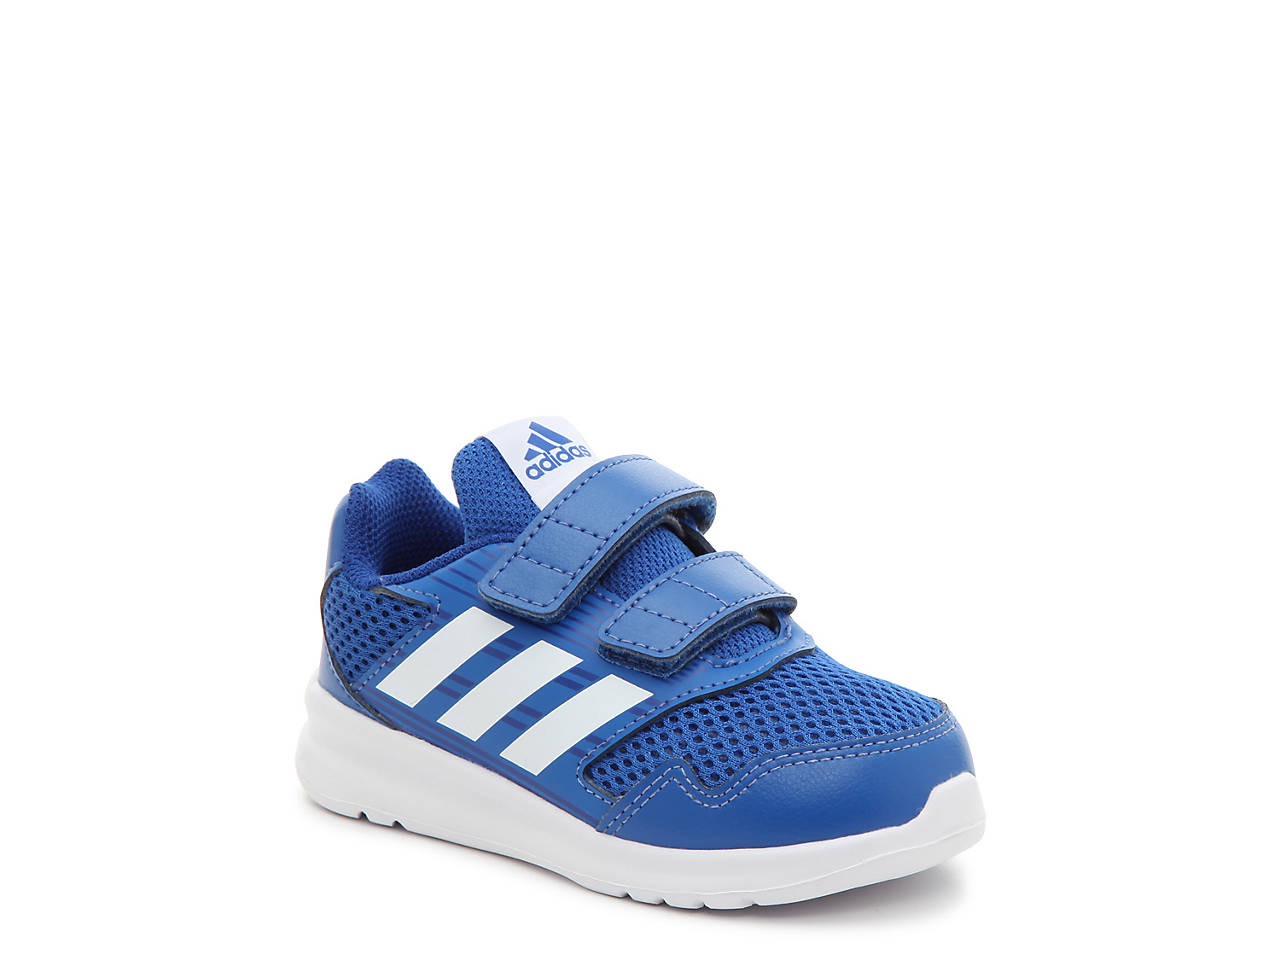 detailed look 61266 8f9e1 adidas. Altarun Toddler Sneaker